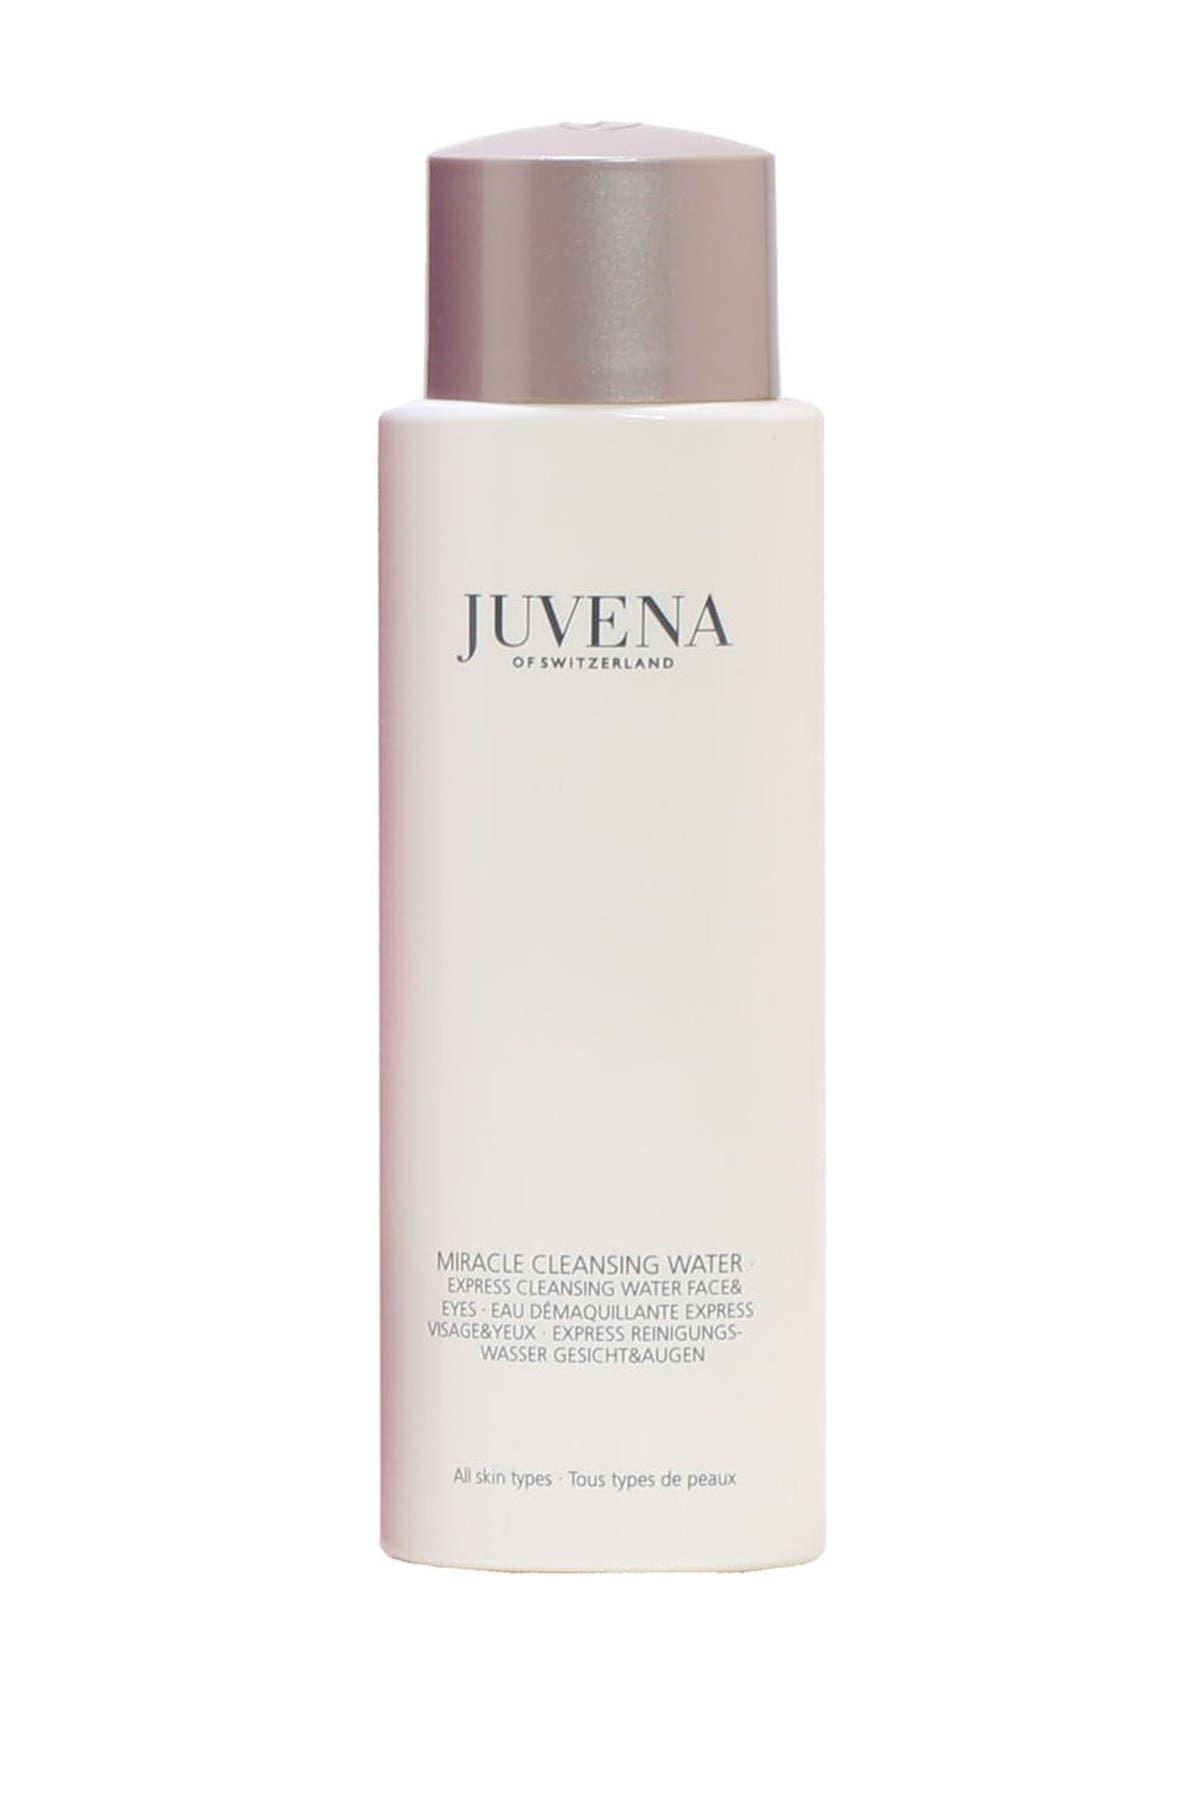 Image of Juvena Miracle Cleansing Water